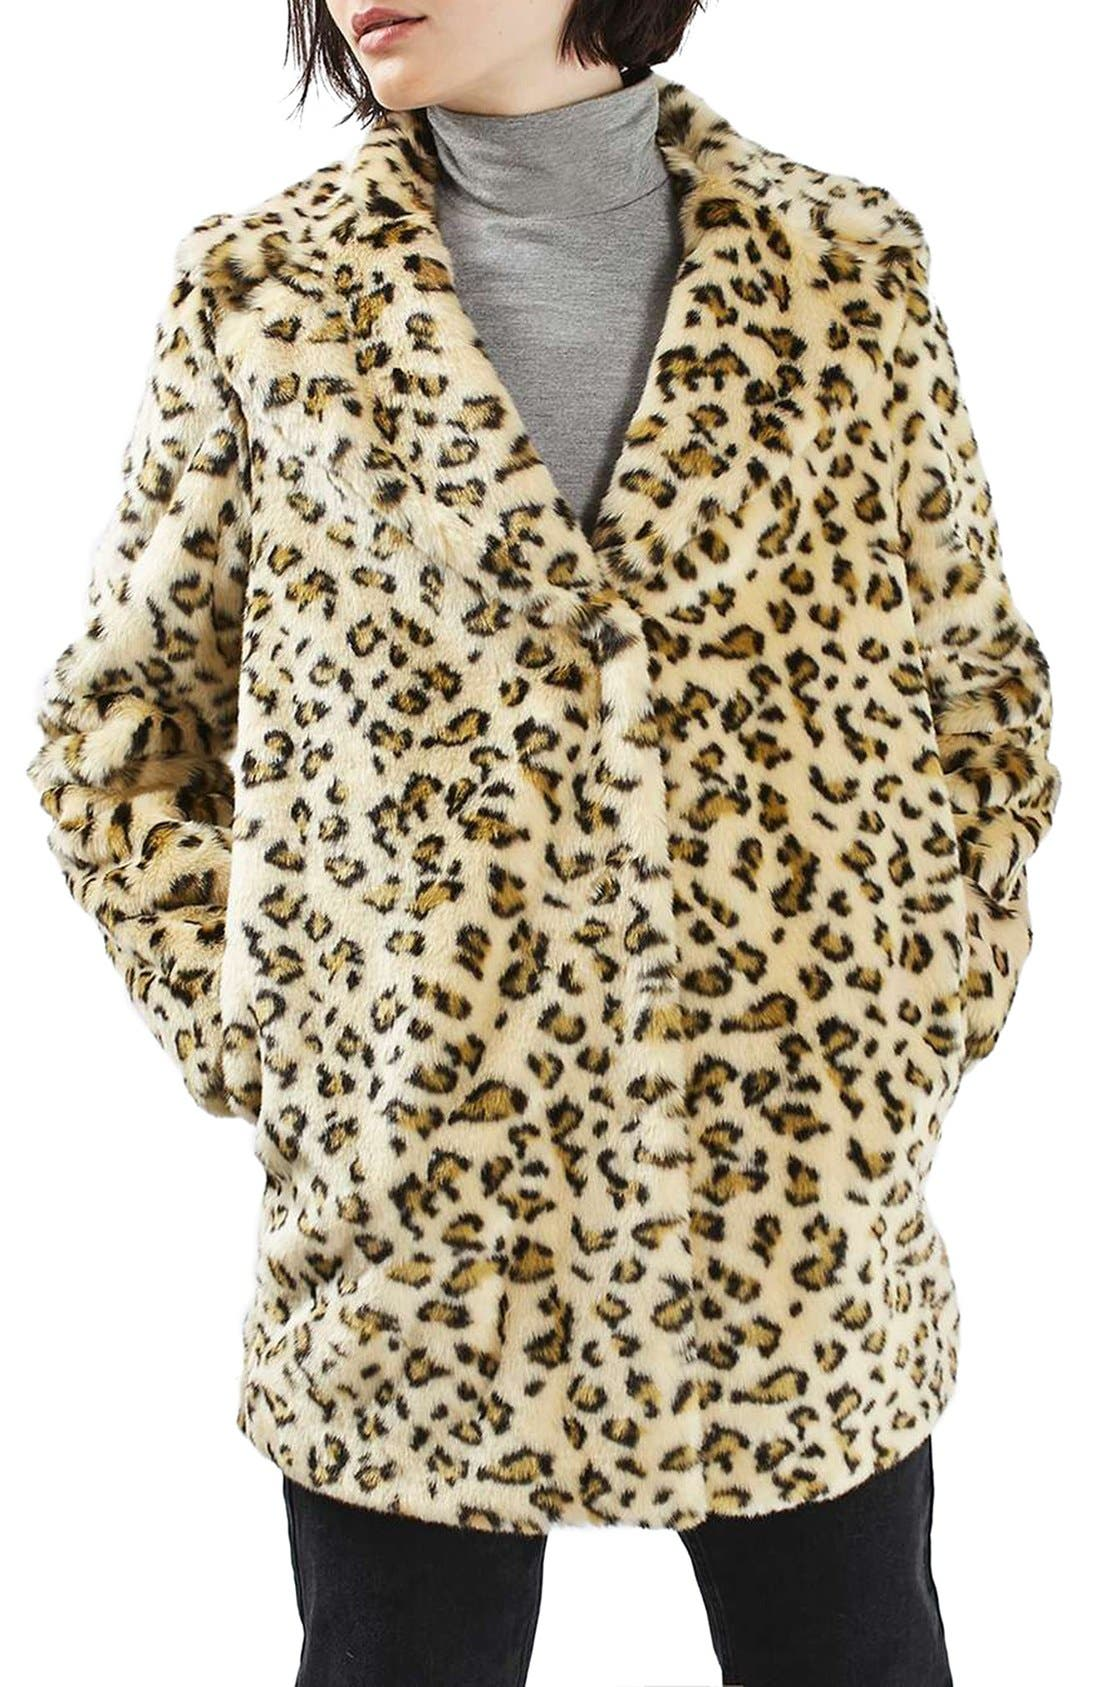 Alternate Image 1 Selected - Topshop Leopard Faux Fur Coat